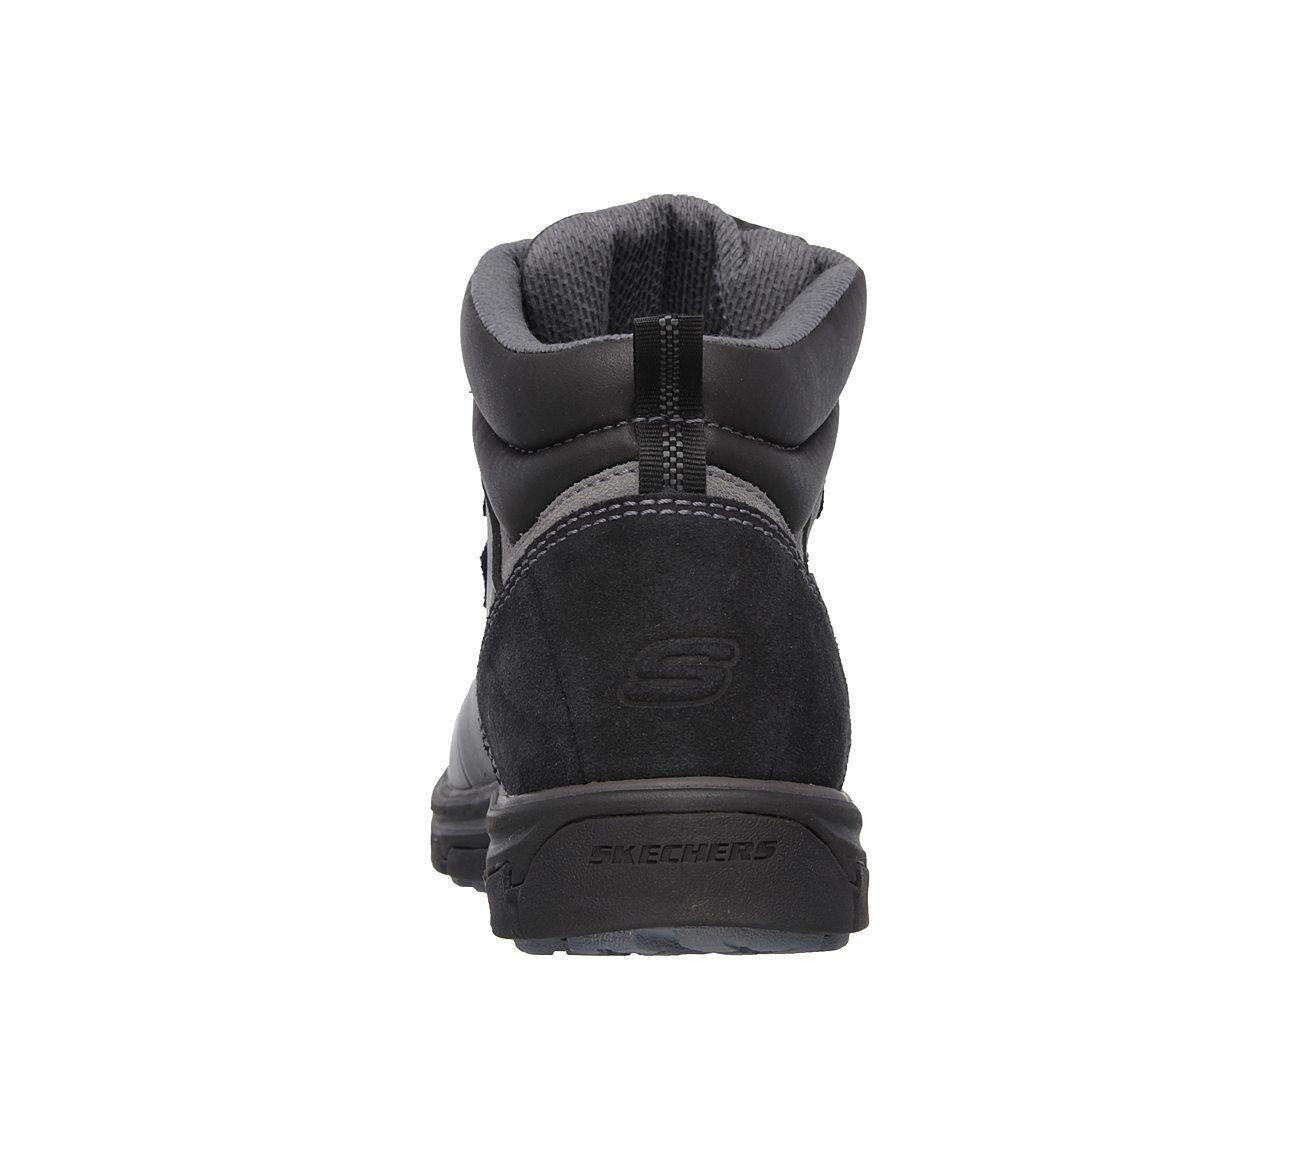 64521 Skechers Para Hombre Negro relajados segmento Ander Bota Negro Hombre 0d58cb